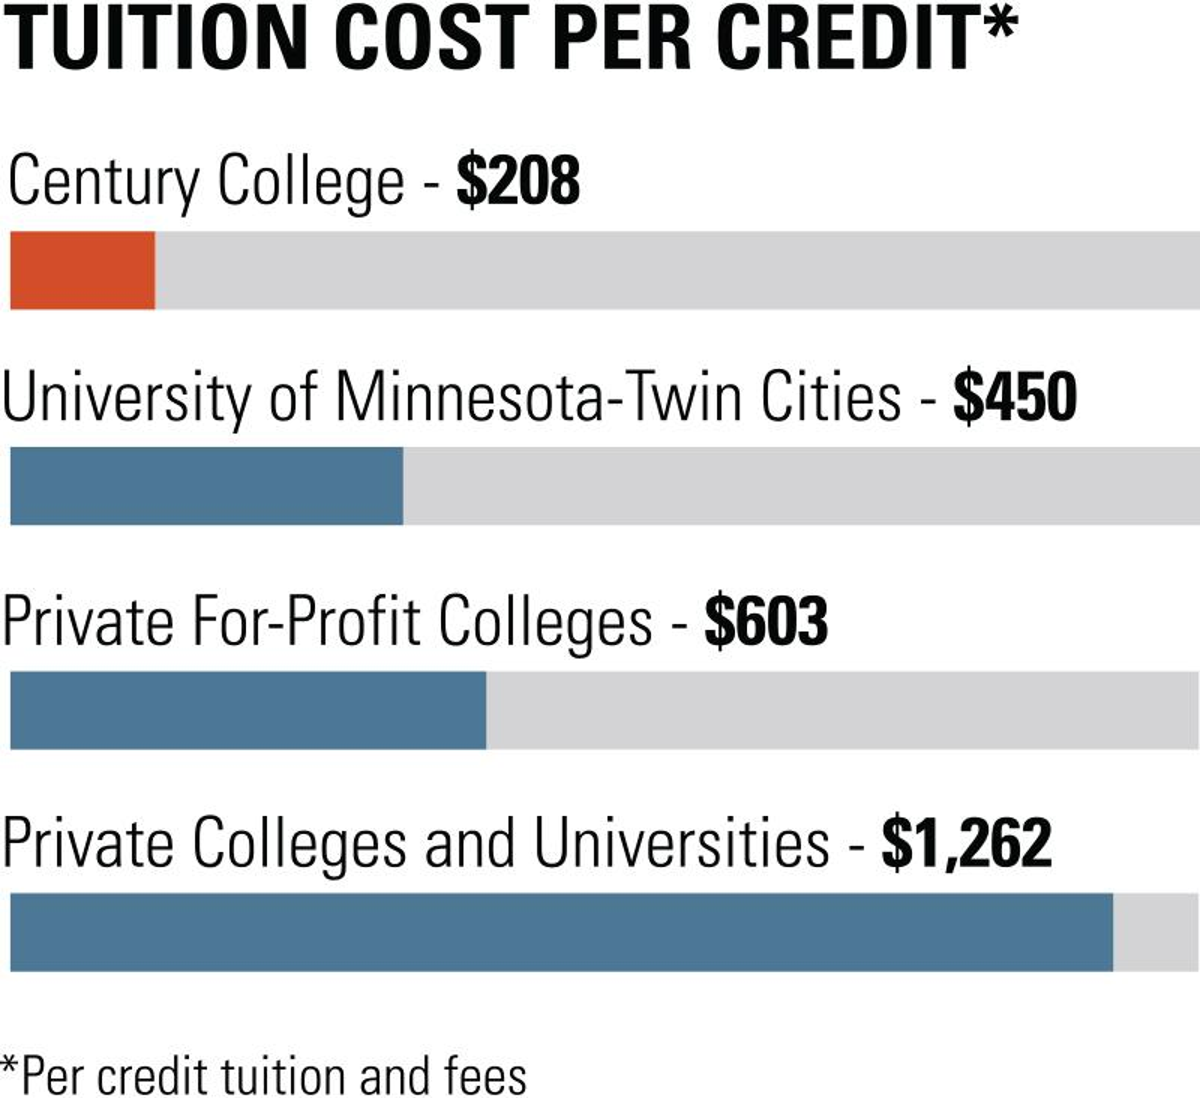 Tuition Cost Per Credit